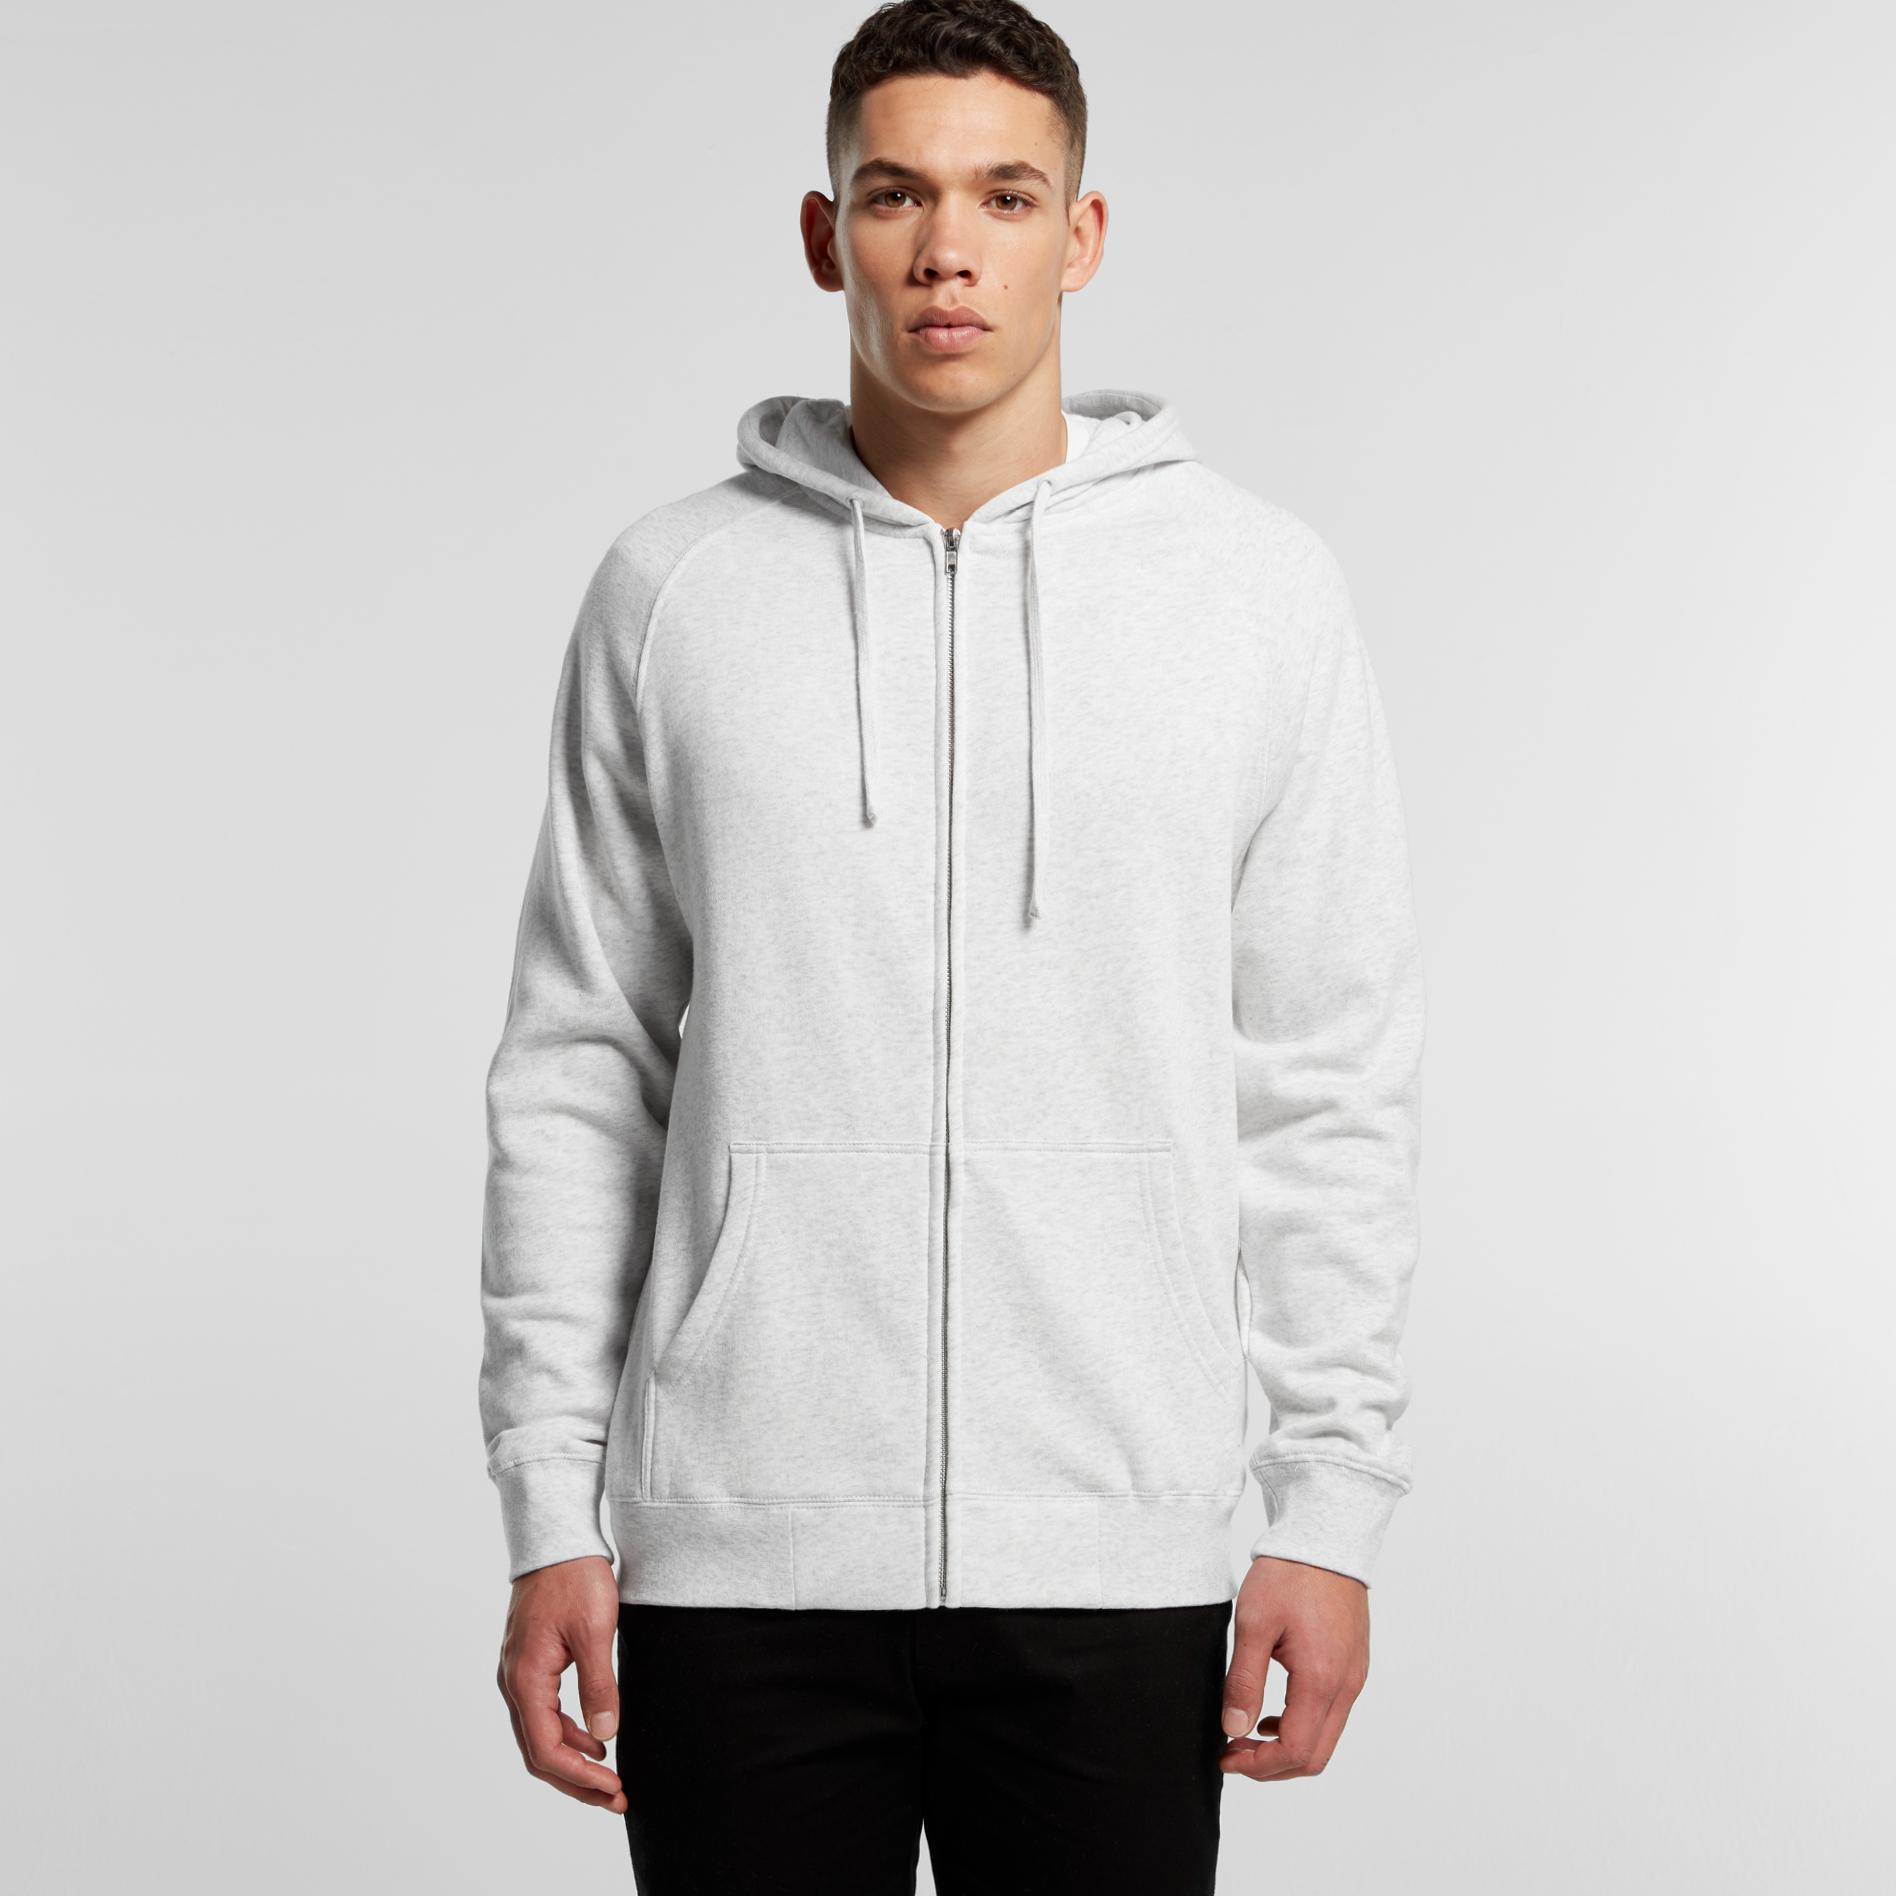 AS Colour Official Zip Hood